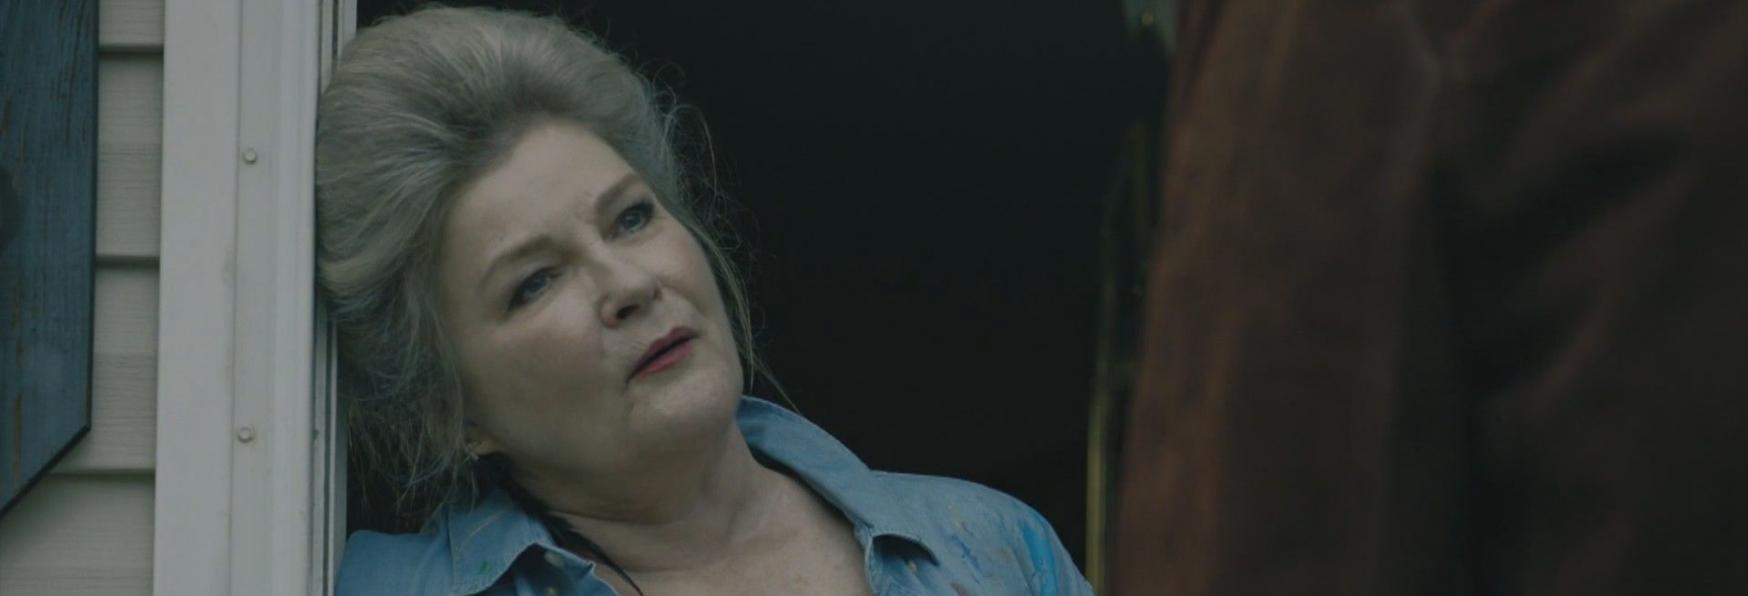 The Man Who Fell to Earth: Kate Mulgrew nel Cast del Reboot